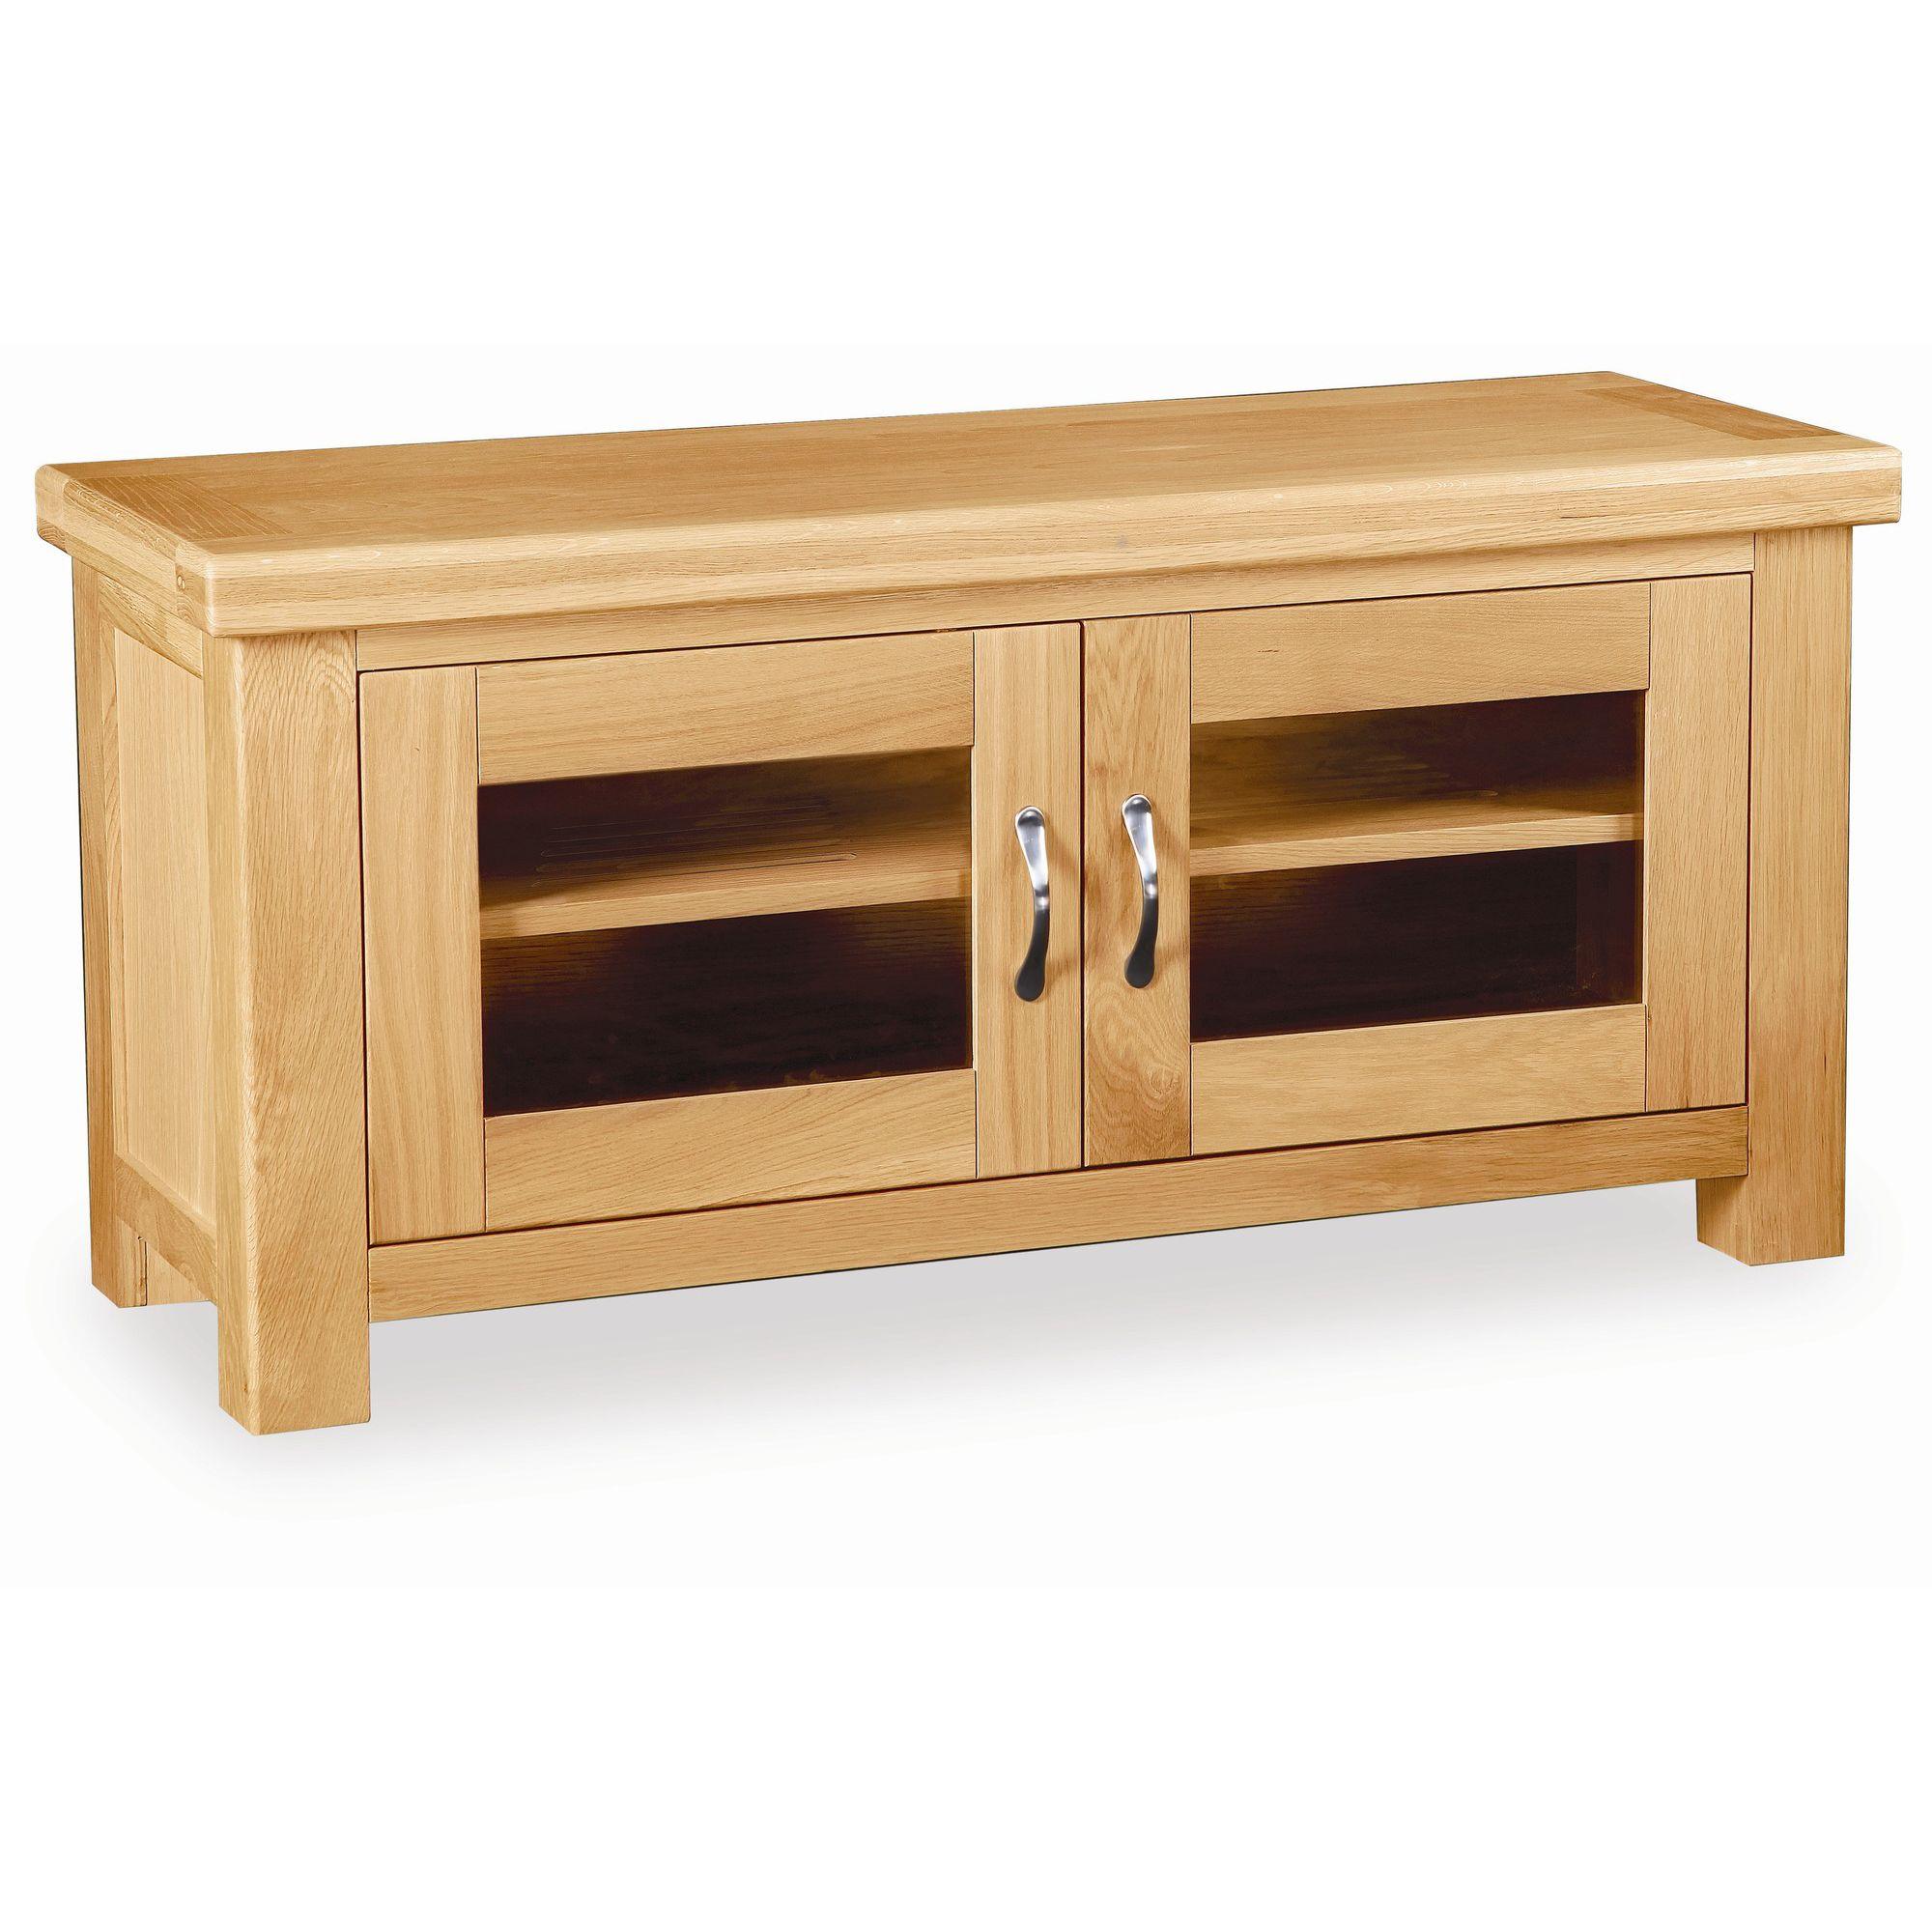 Alterton Furniture Highgate TV Cabinet at Tesco Direct